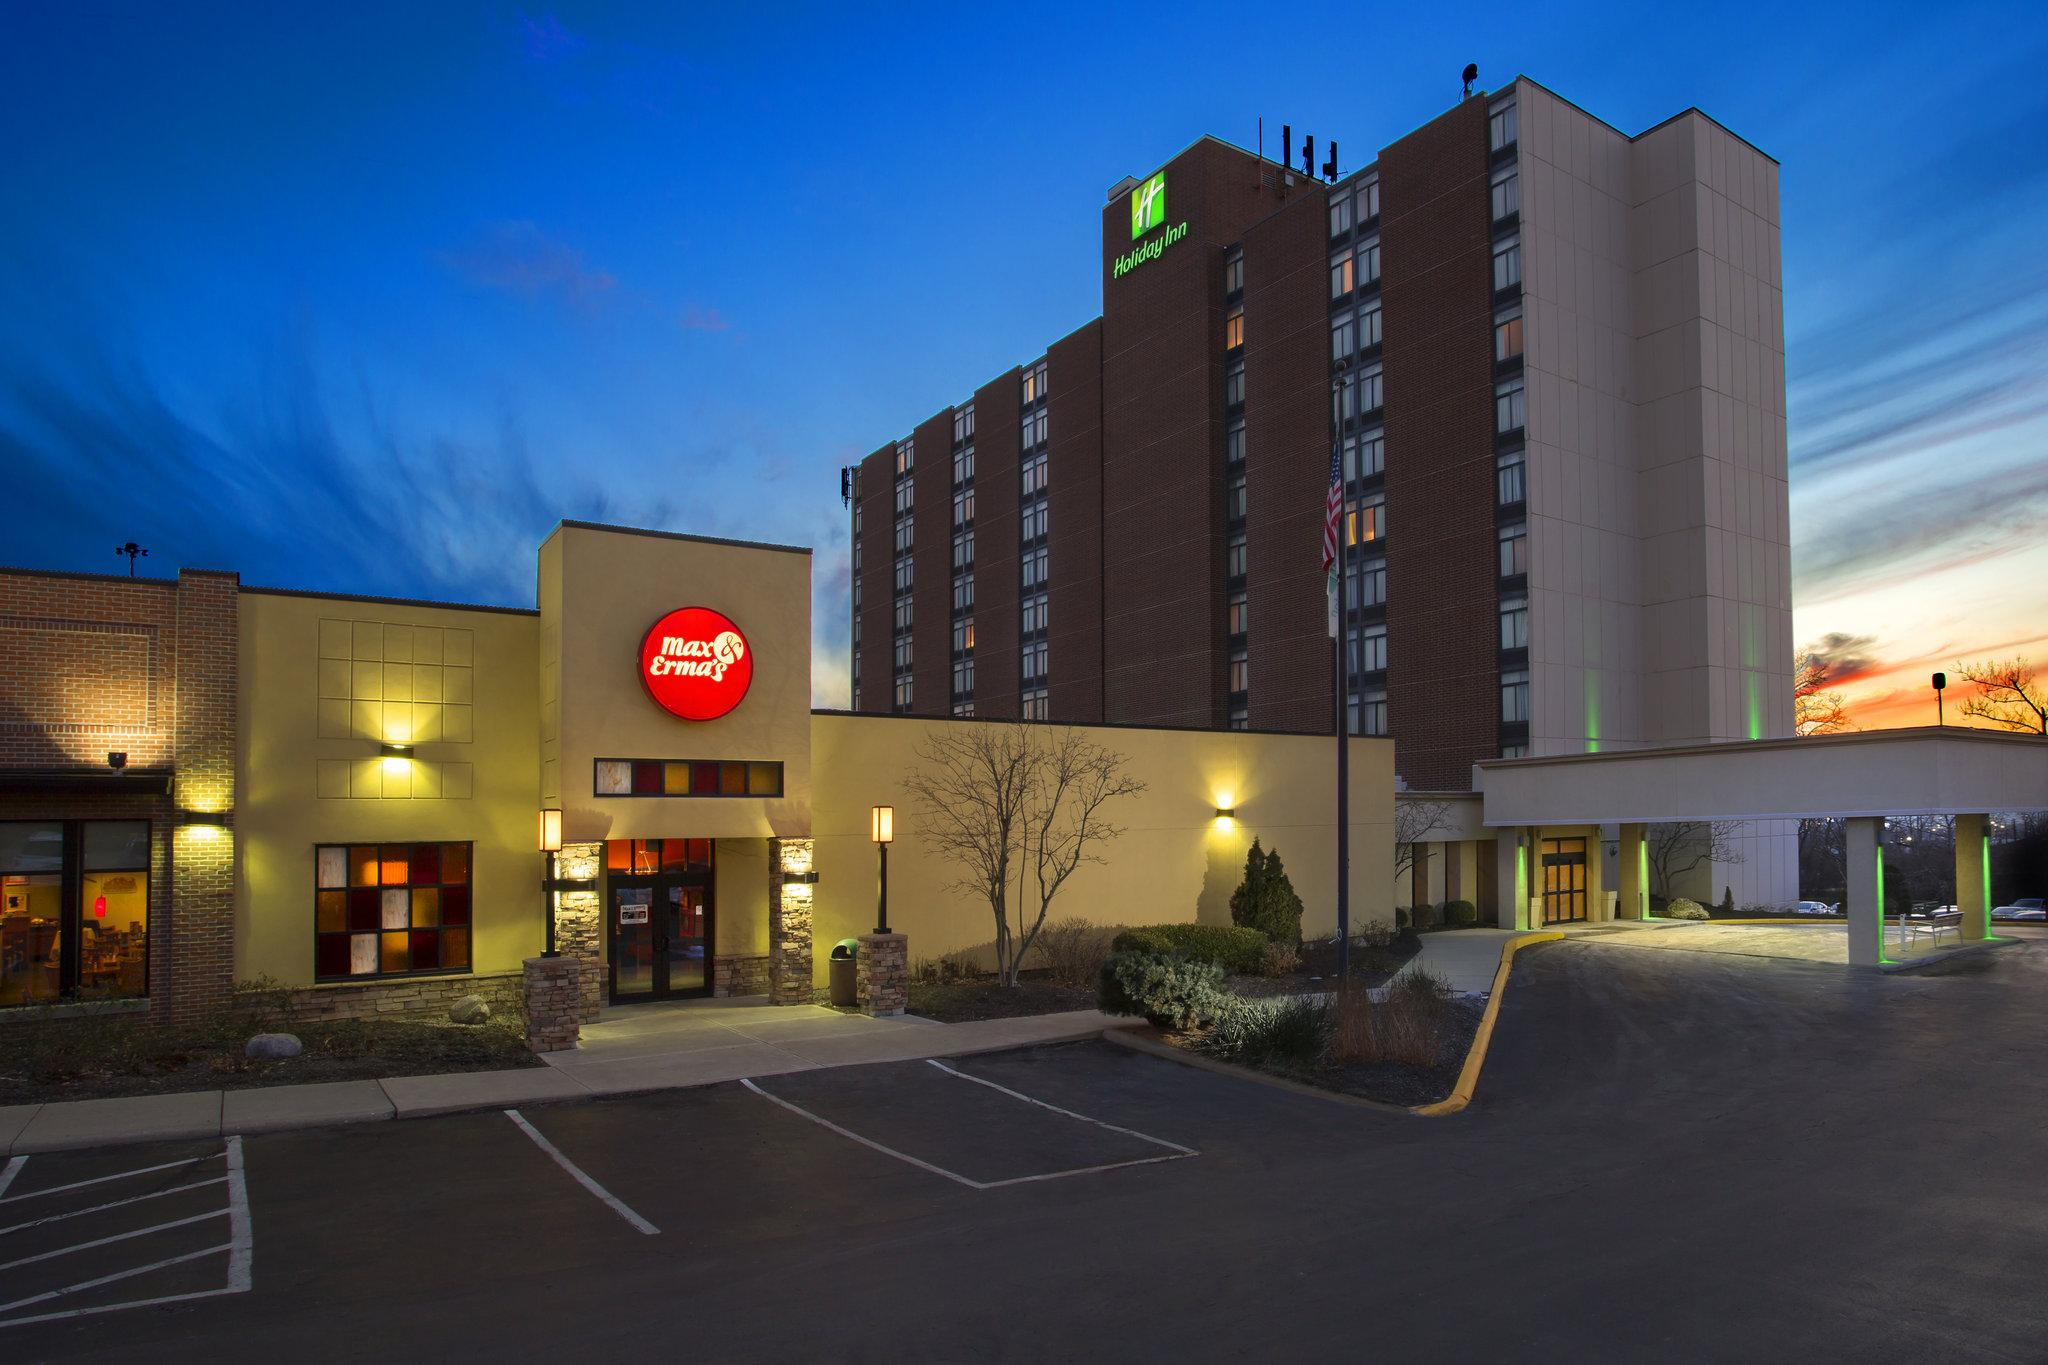 Holiday Inn Cincinnati - I-275 North